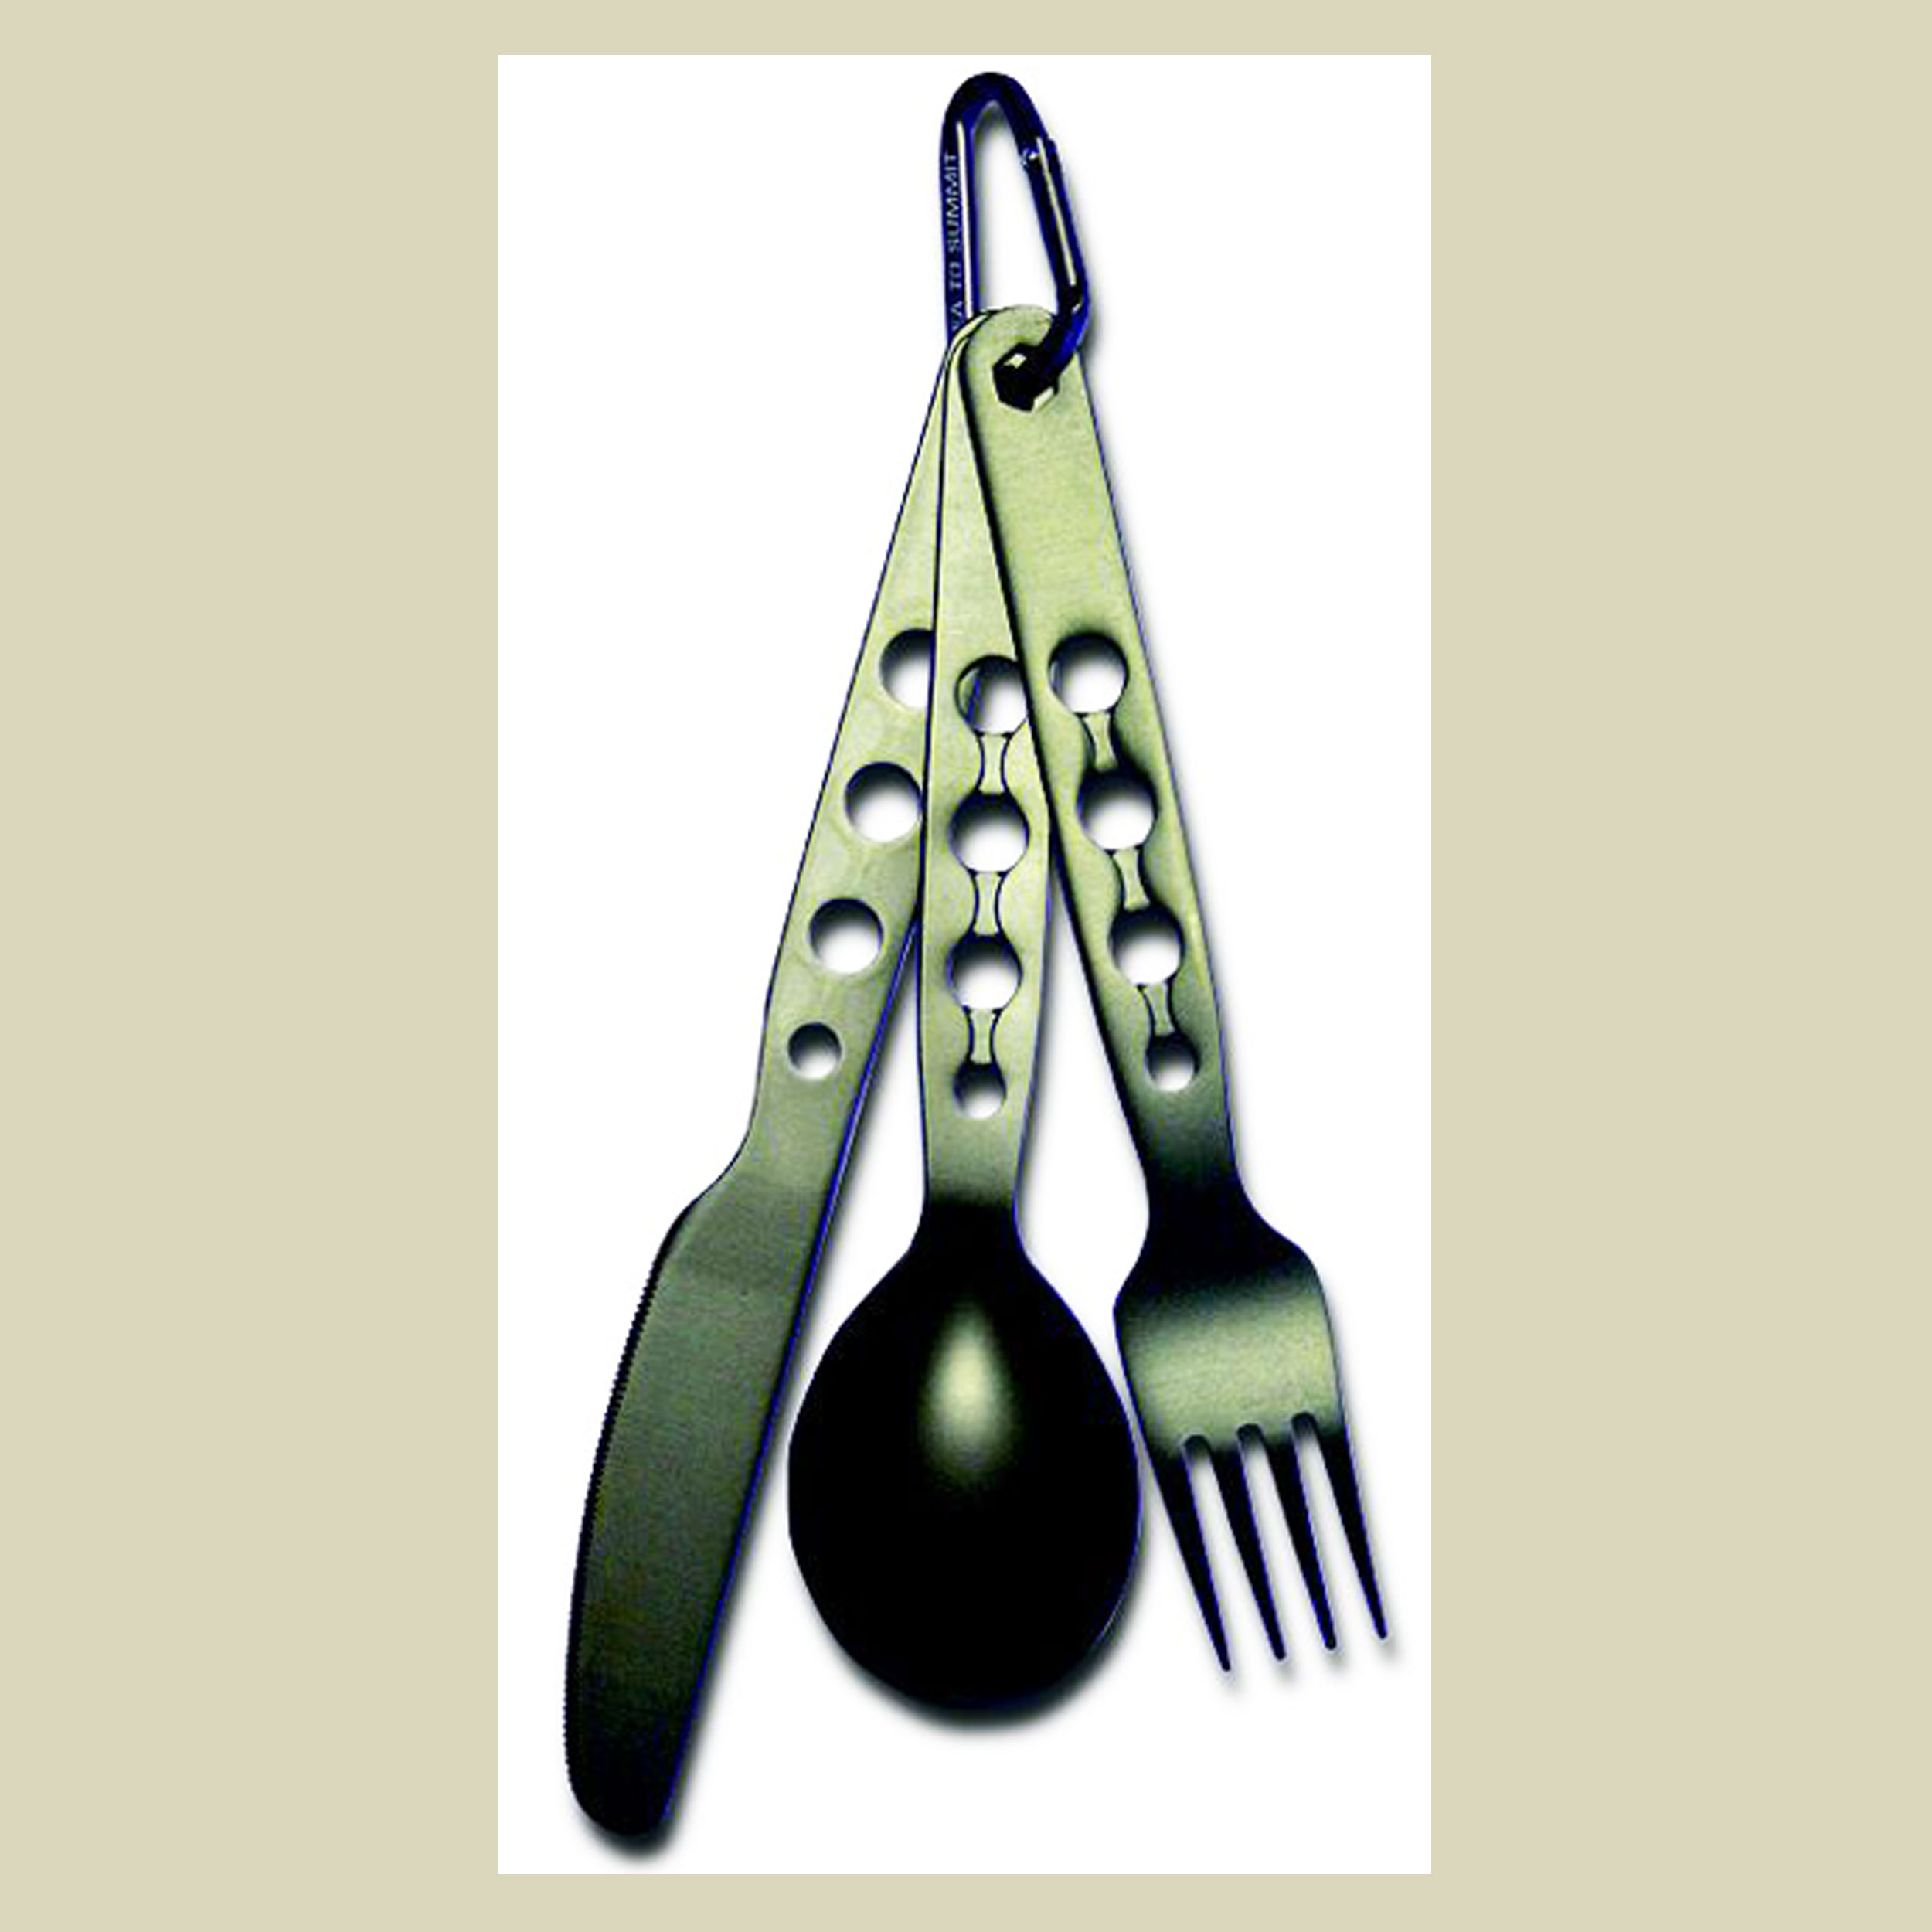 Sea to Summit Alphaset 3pc Cutlery Set Campingbesteck Messer-Gabel-Löffel-Set